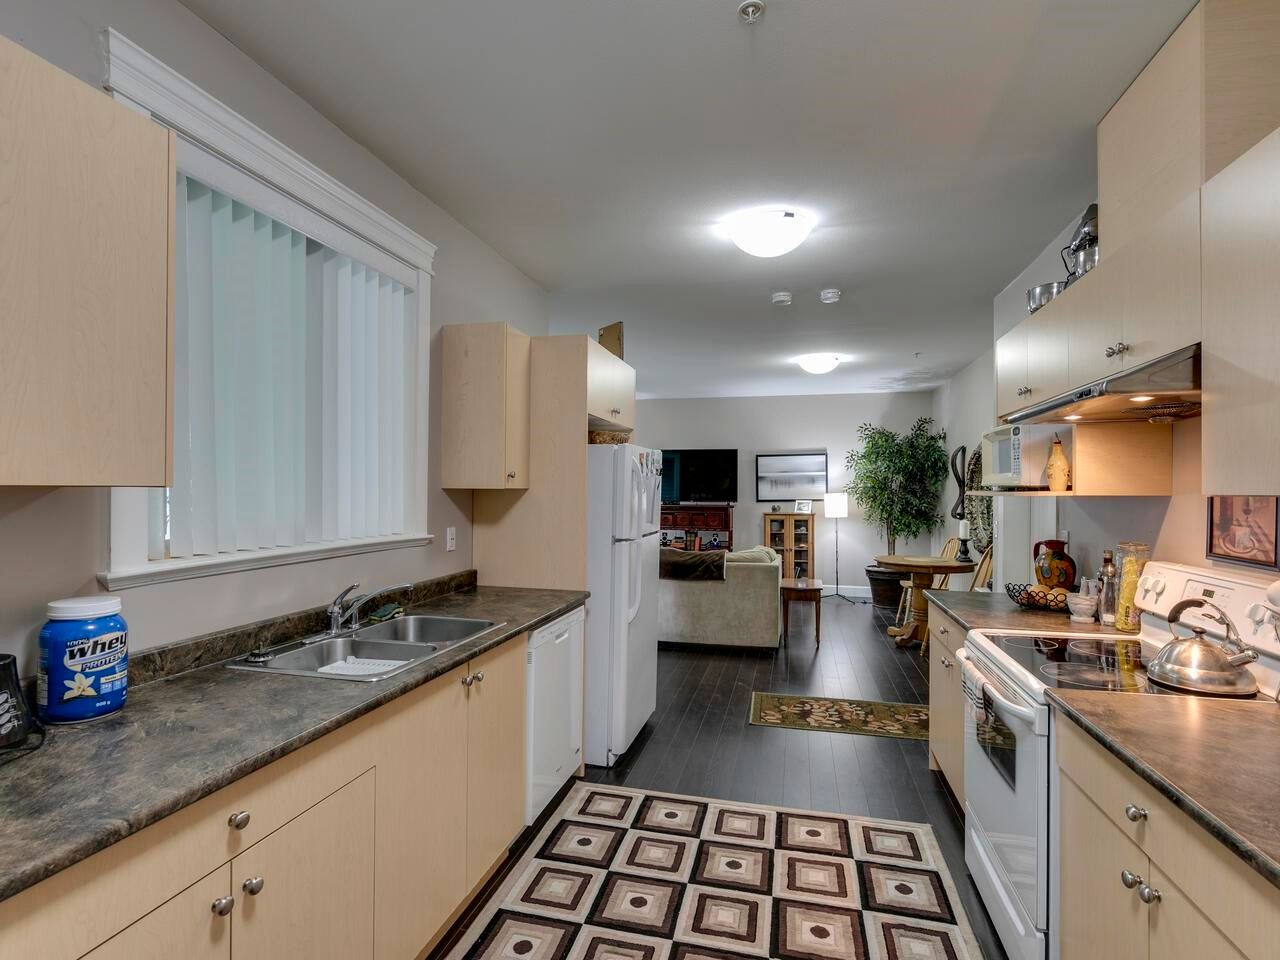 "Photo 25: Photos: 22845 126B Avenue in Maple Ridge: East Central House for sale in ""EAST CENTRAL MAPLE RIDGE"" : MLS®# R2594638"